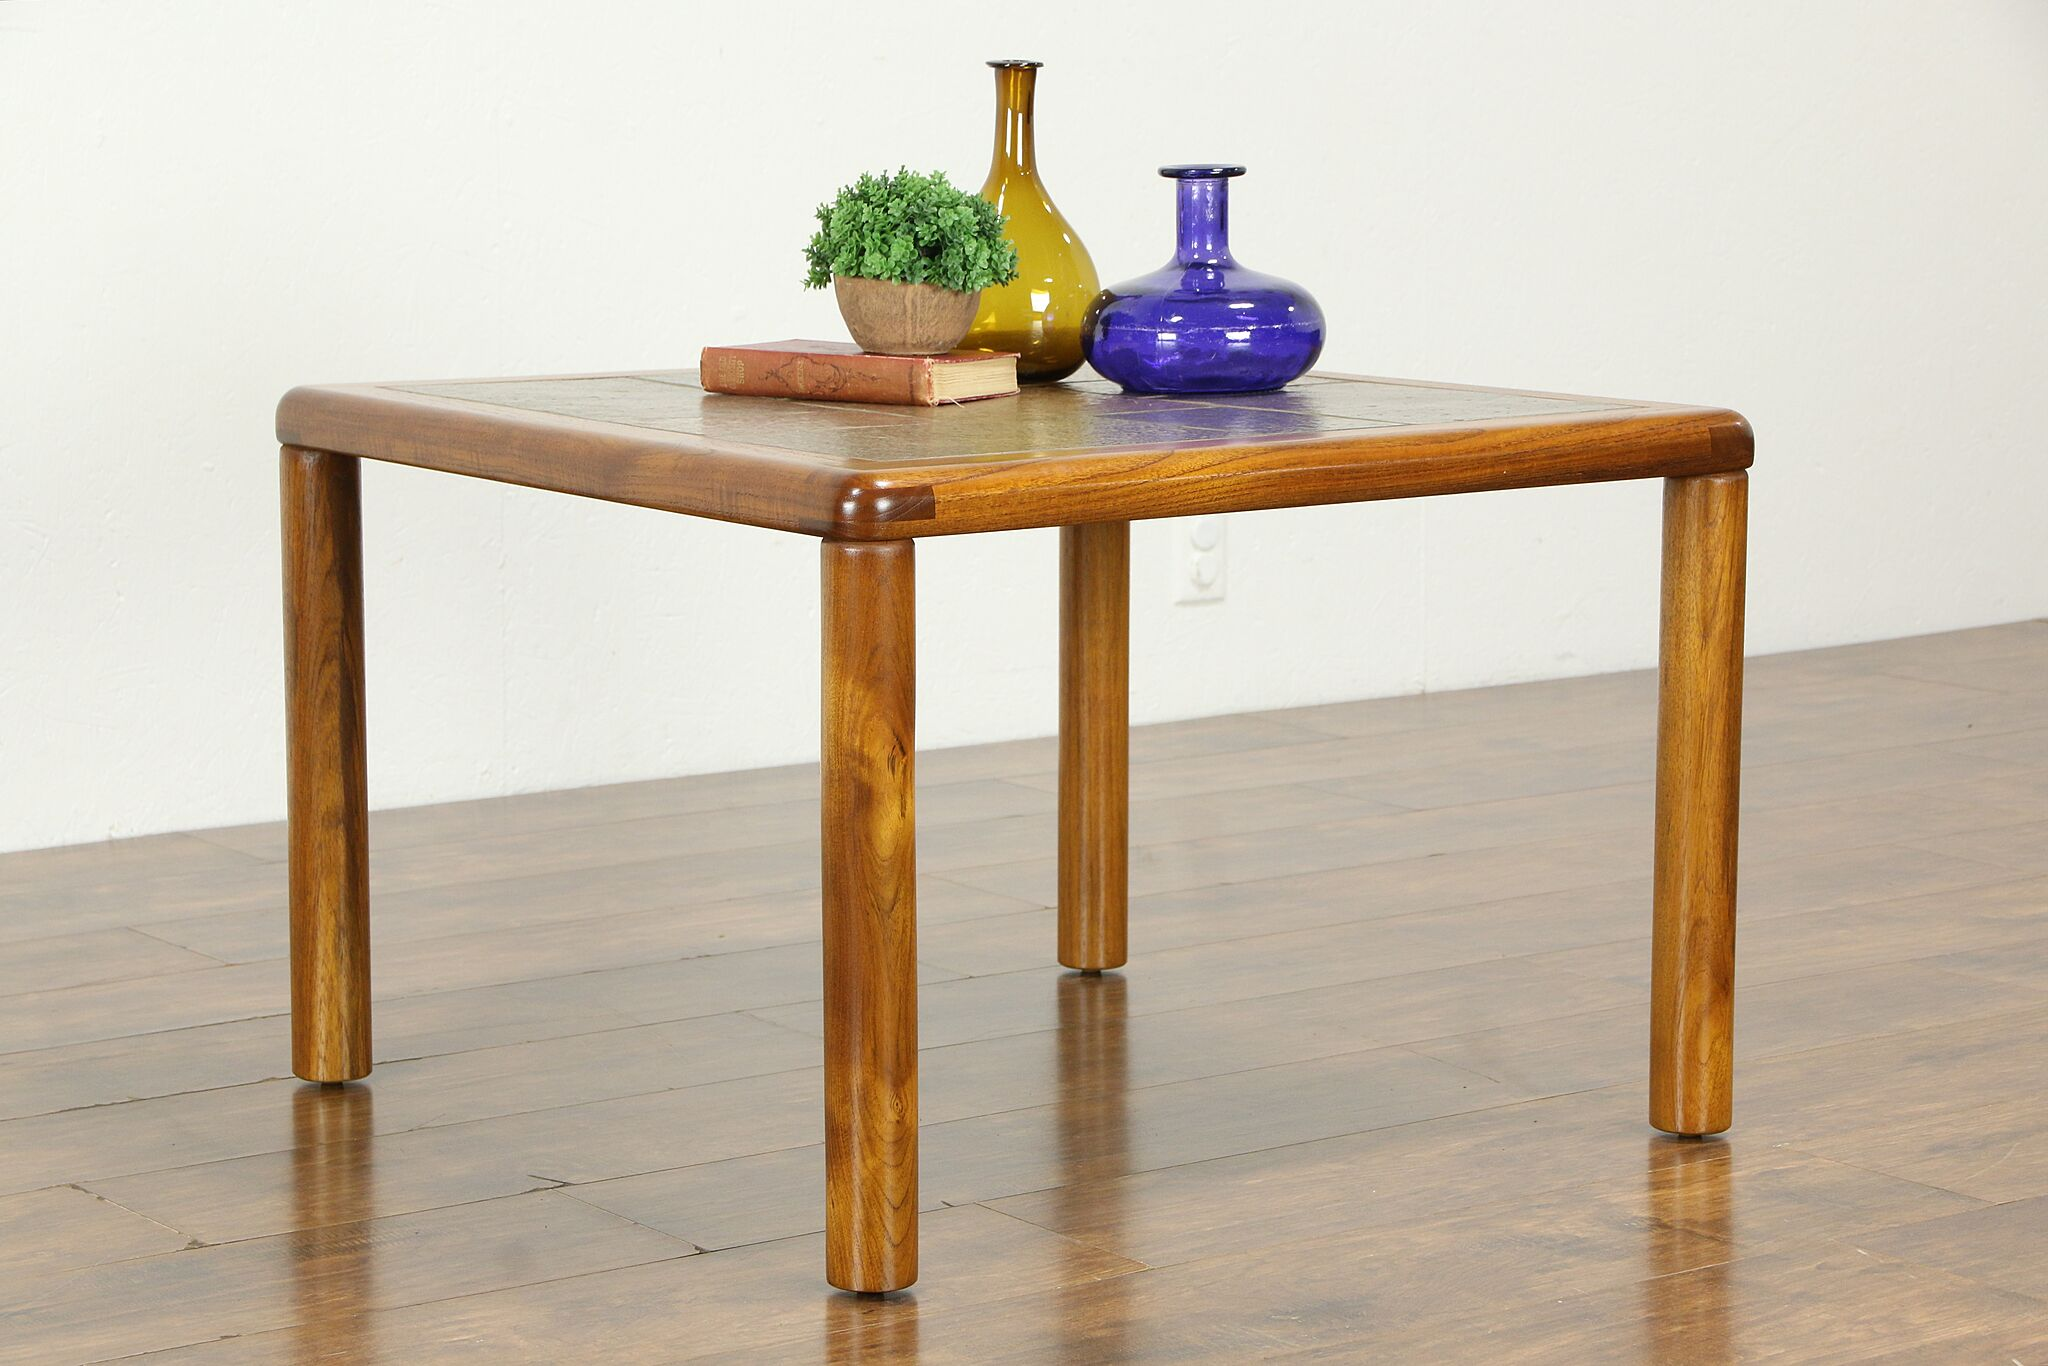 Midcentury Modern Poulsen Haslev Danish Vintage Teak Slate Coffee Table 34305 Harp Gallery Antiques Furniture